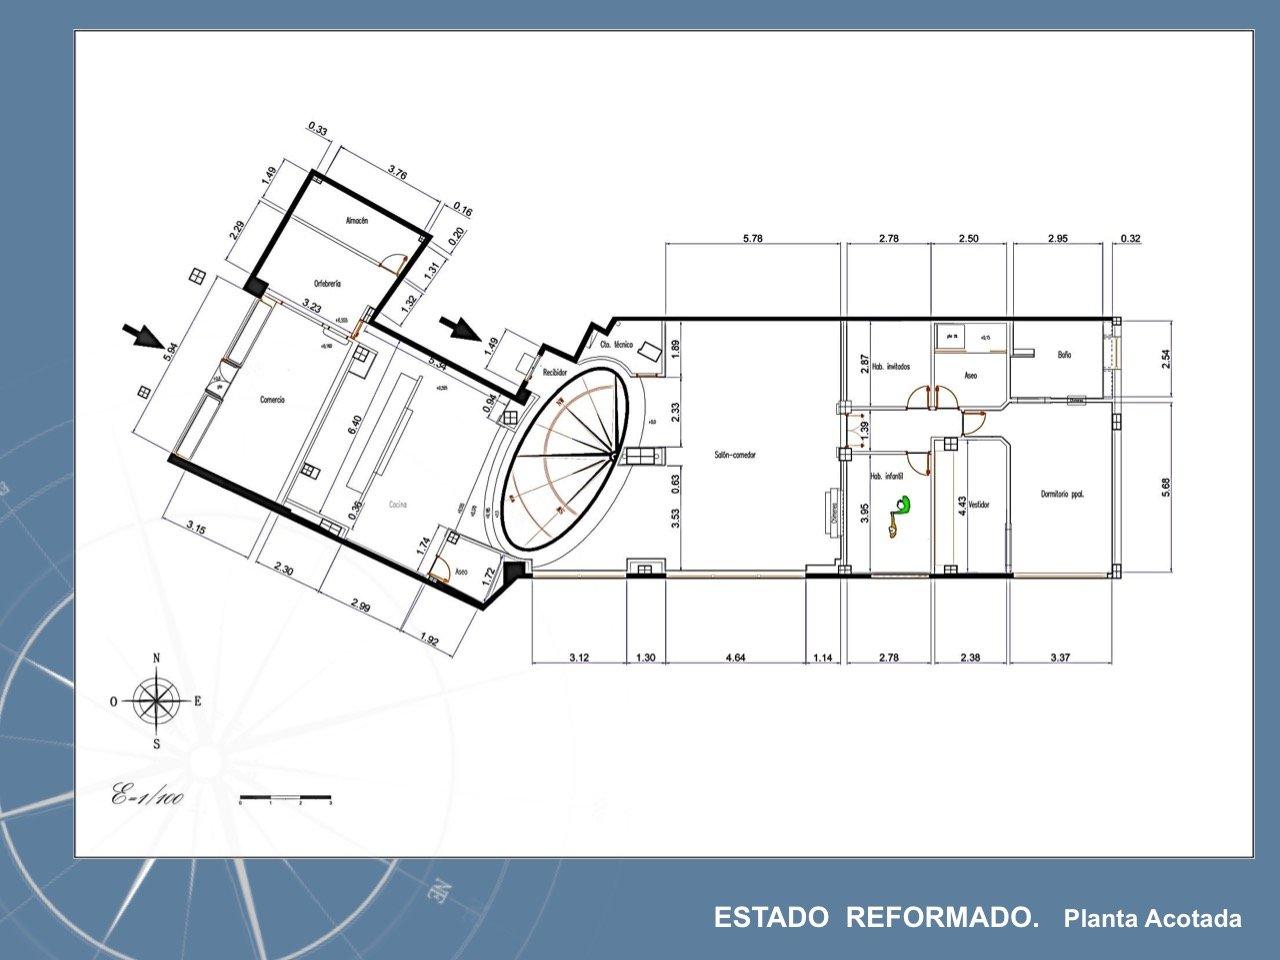 proyectos-jose-ramon-pardo07